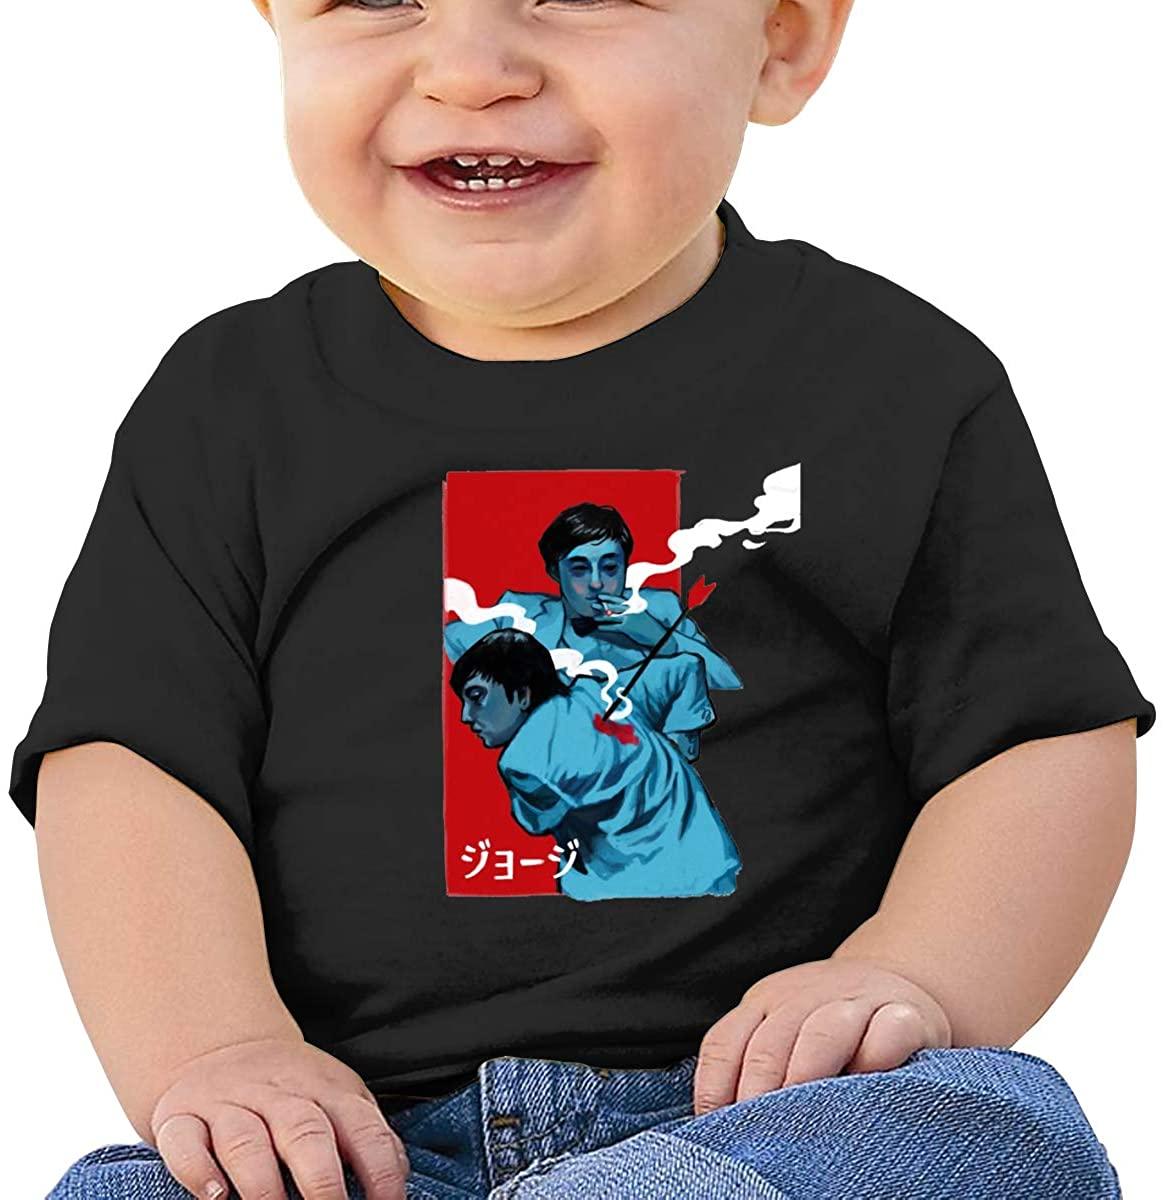 AP.Room Colorful Short-Sleeved Comfortable and Refreshing Shirt Joji Baby T-Shirt